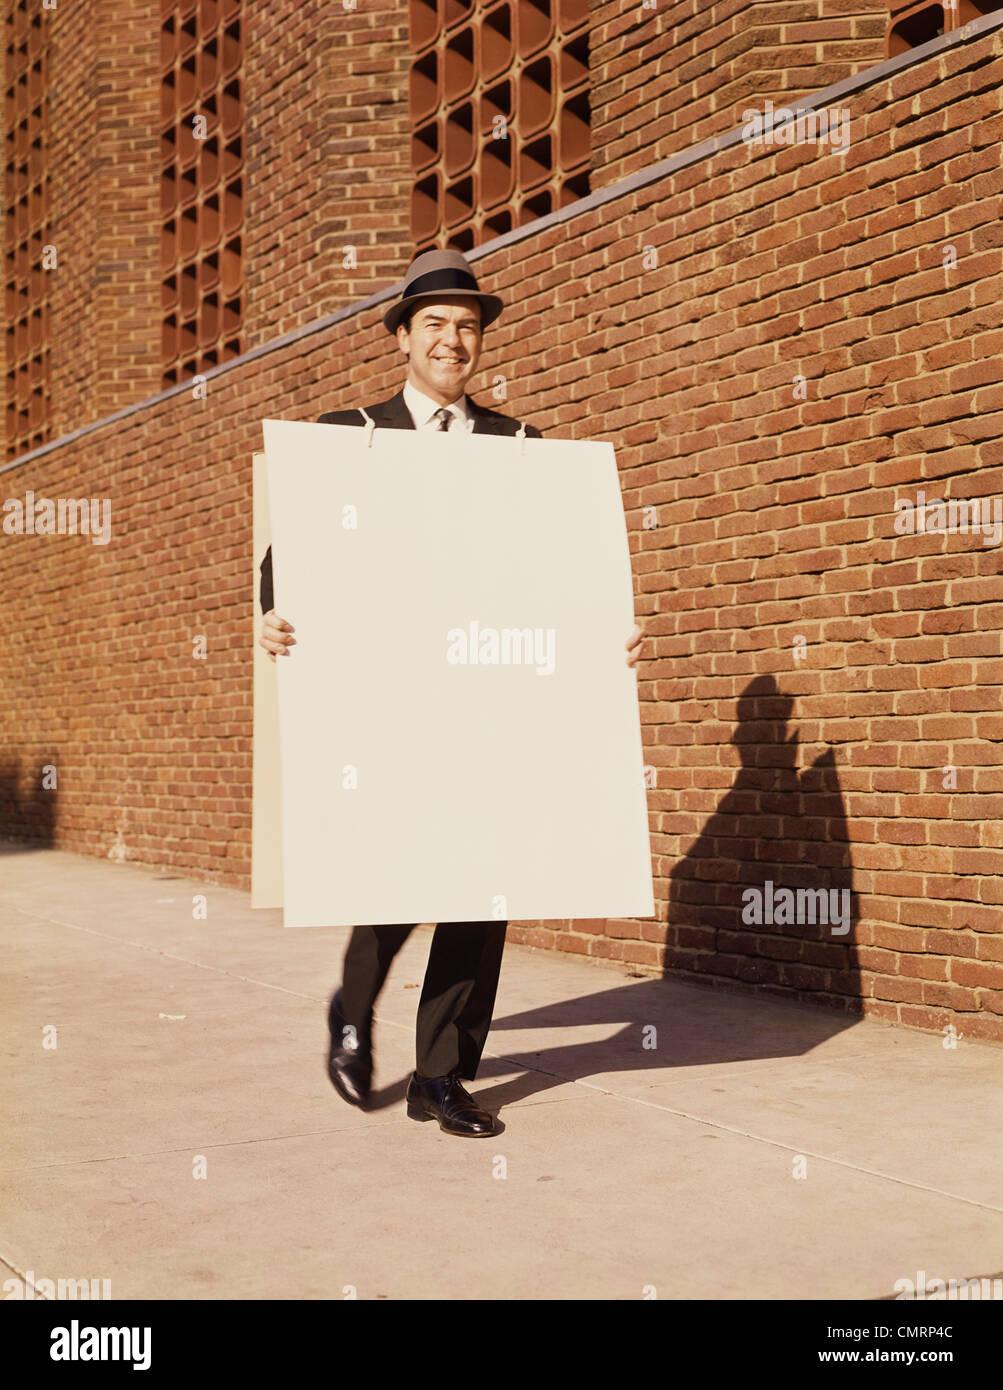 MAN WALKING PANNEAU HAT RETRO 1950 1950 Photo Stock